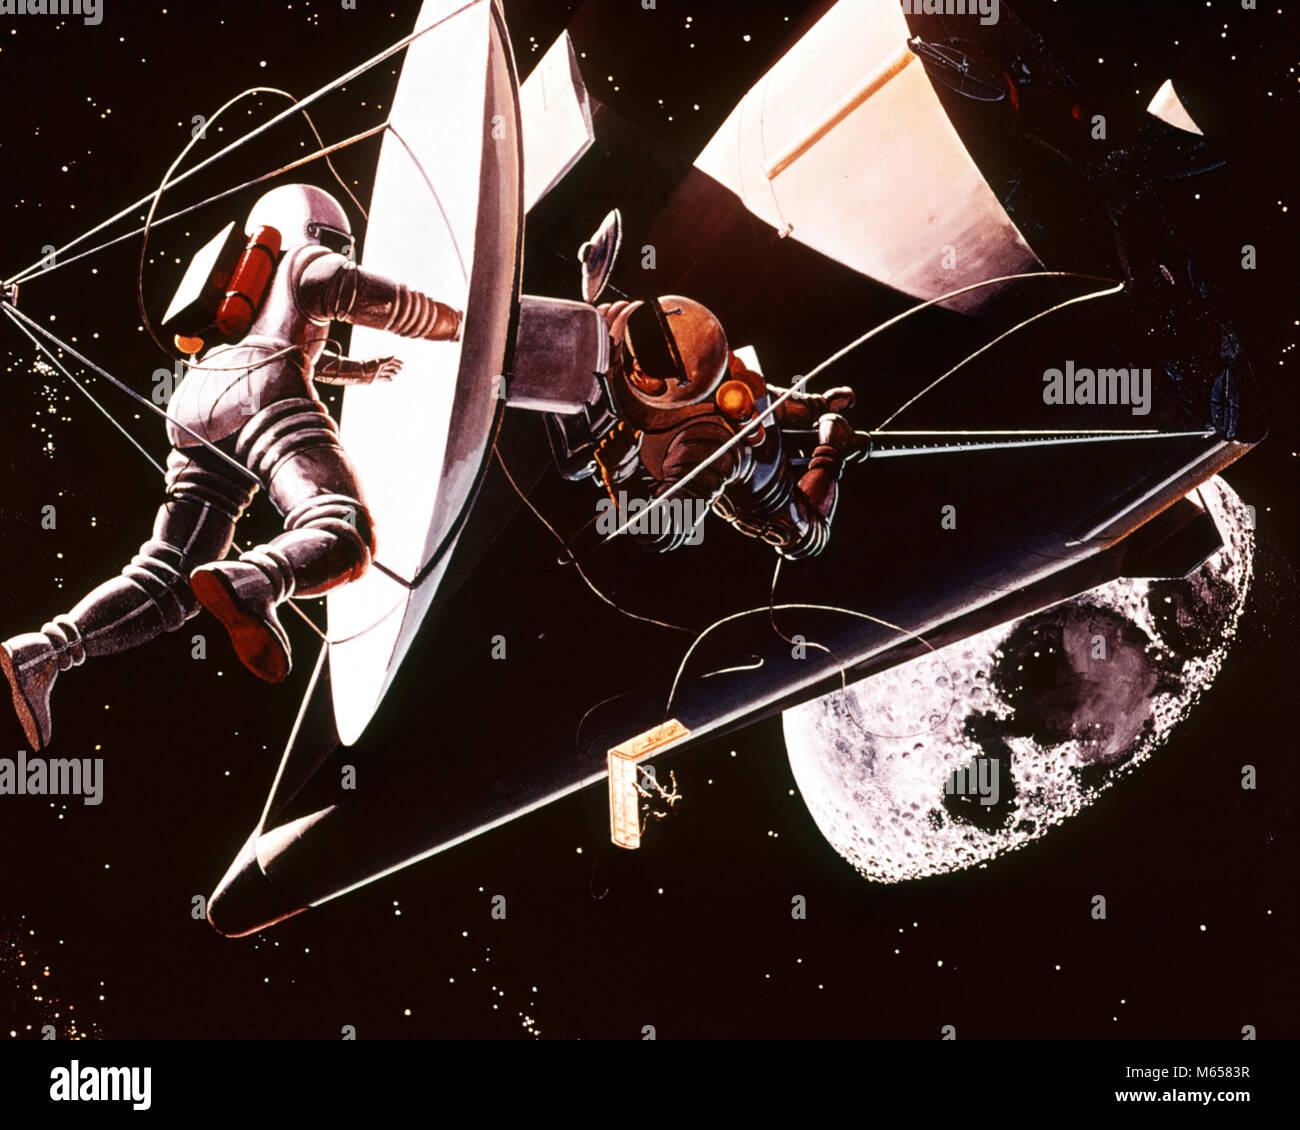 1960s NASA ILLUSTRATION DRAWING TWO ASTRONAUTS EVA WORKING DISK SPACE VEHICLE - ka1331 HAR001 HARS NOSTALGIA TOGETHERNESS - Stock Image